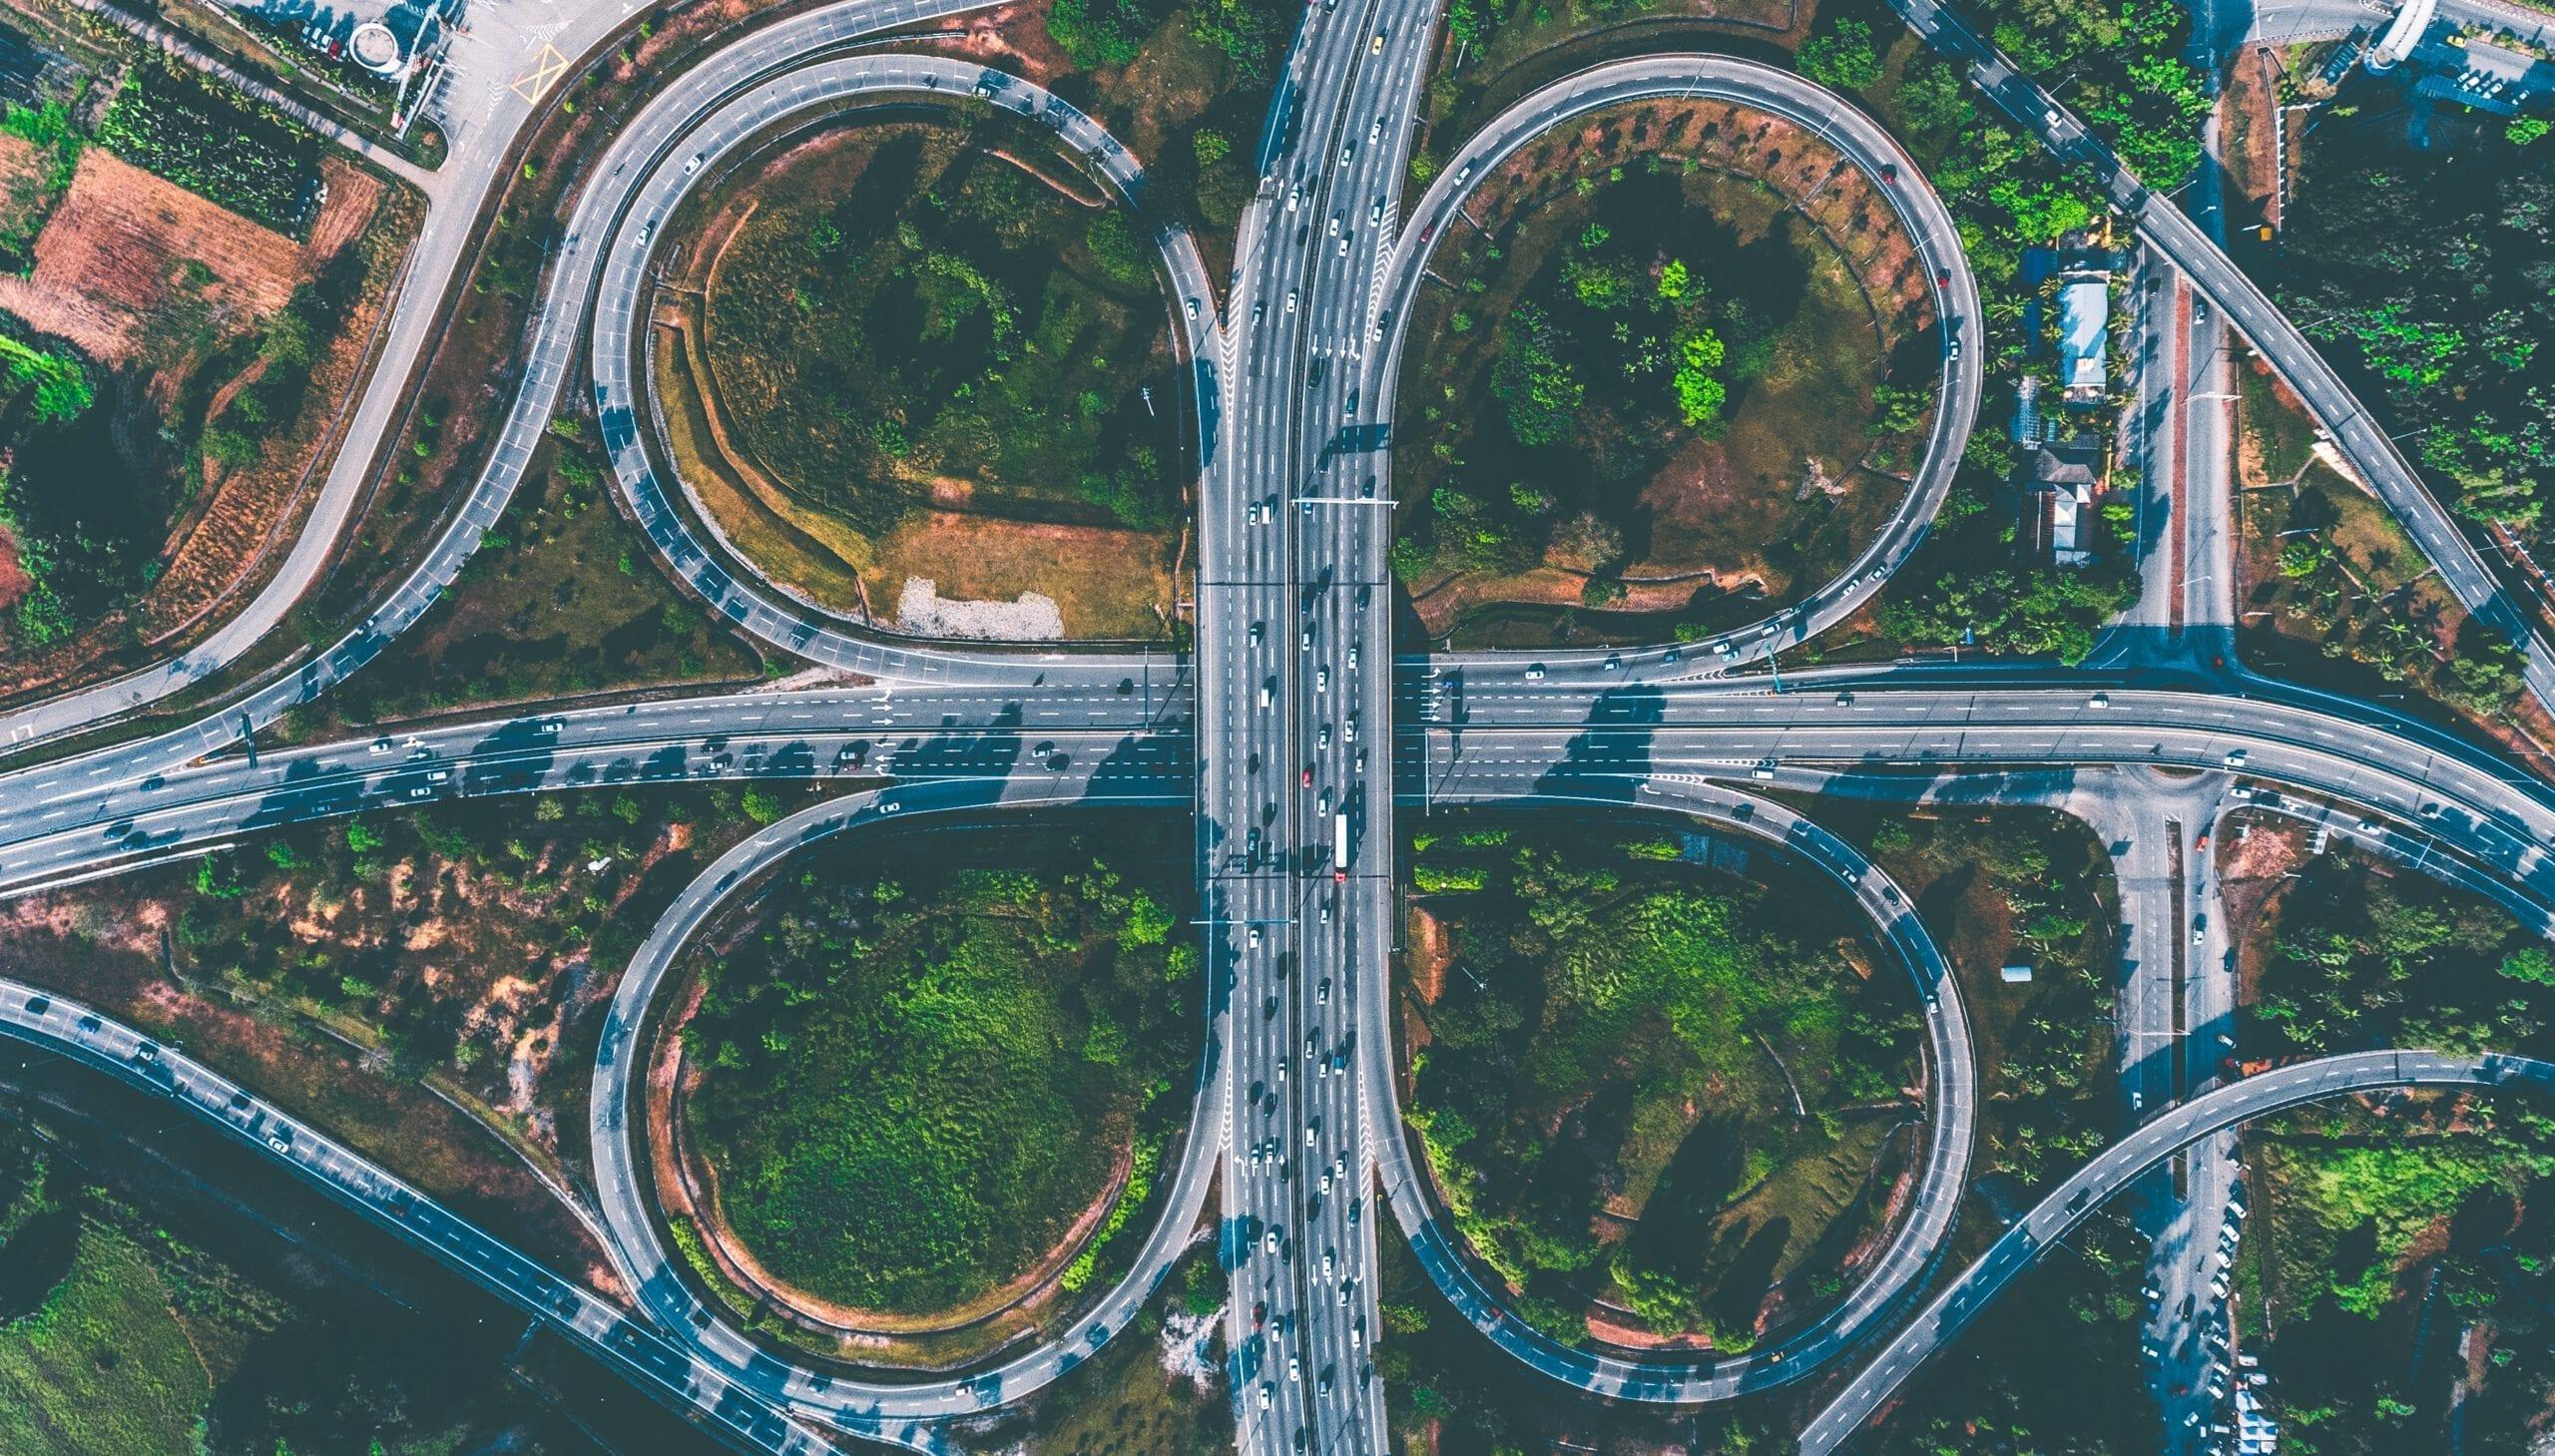 bird's eye view of freeway